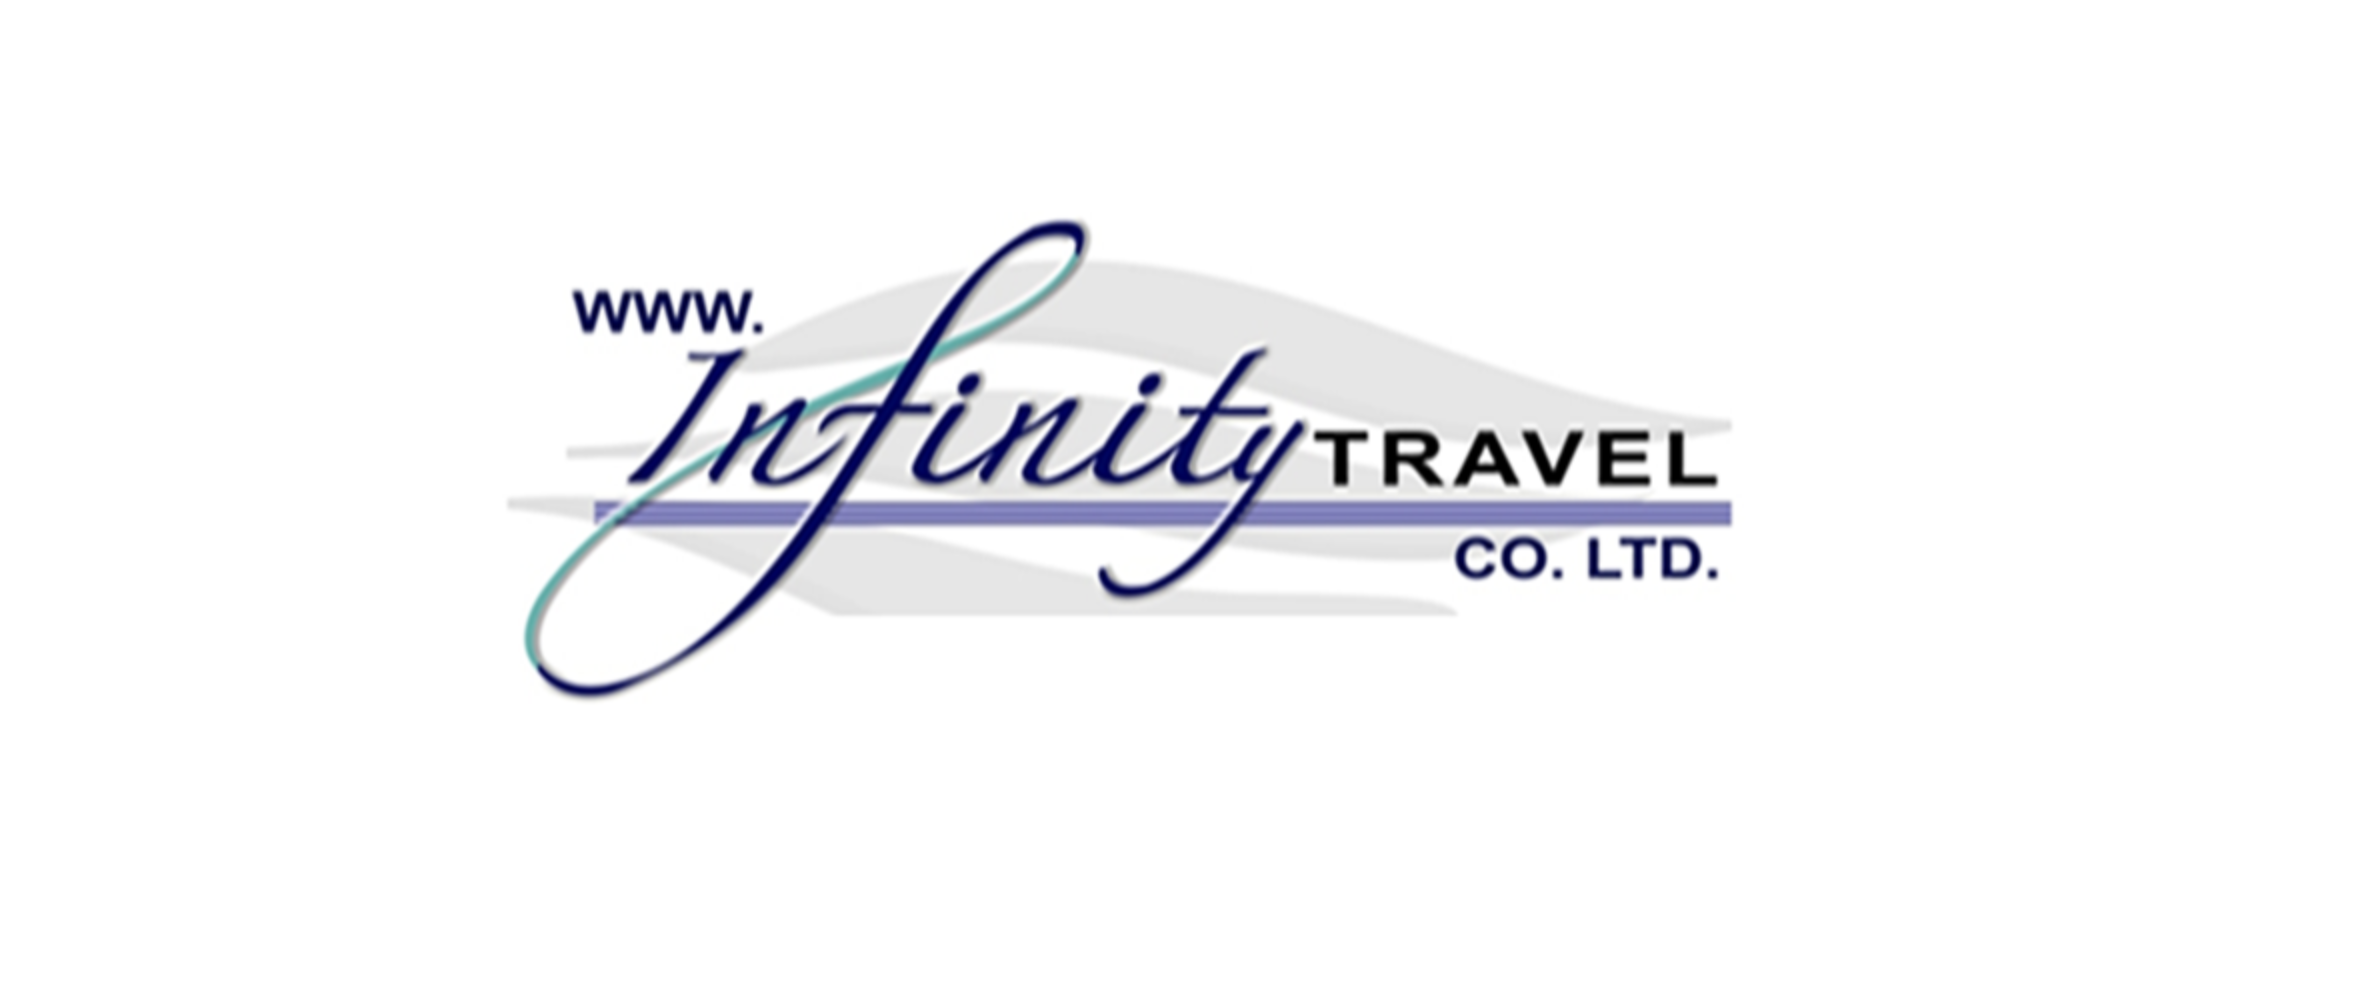 https://tourism.davaocity.gov.ph/wp-content/uploads/2019/12/Screen-Shot-2019-12-16-at-1.13.29-PM.png